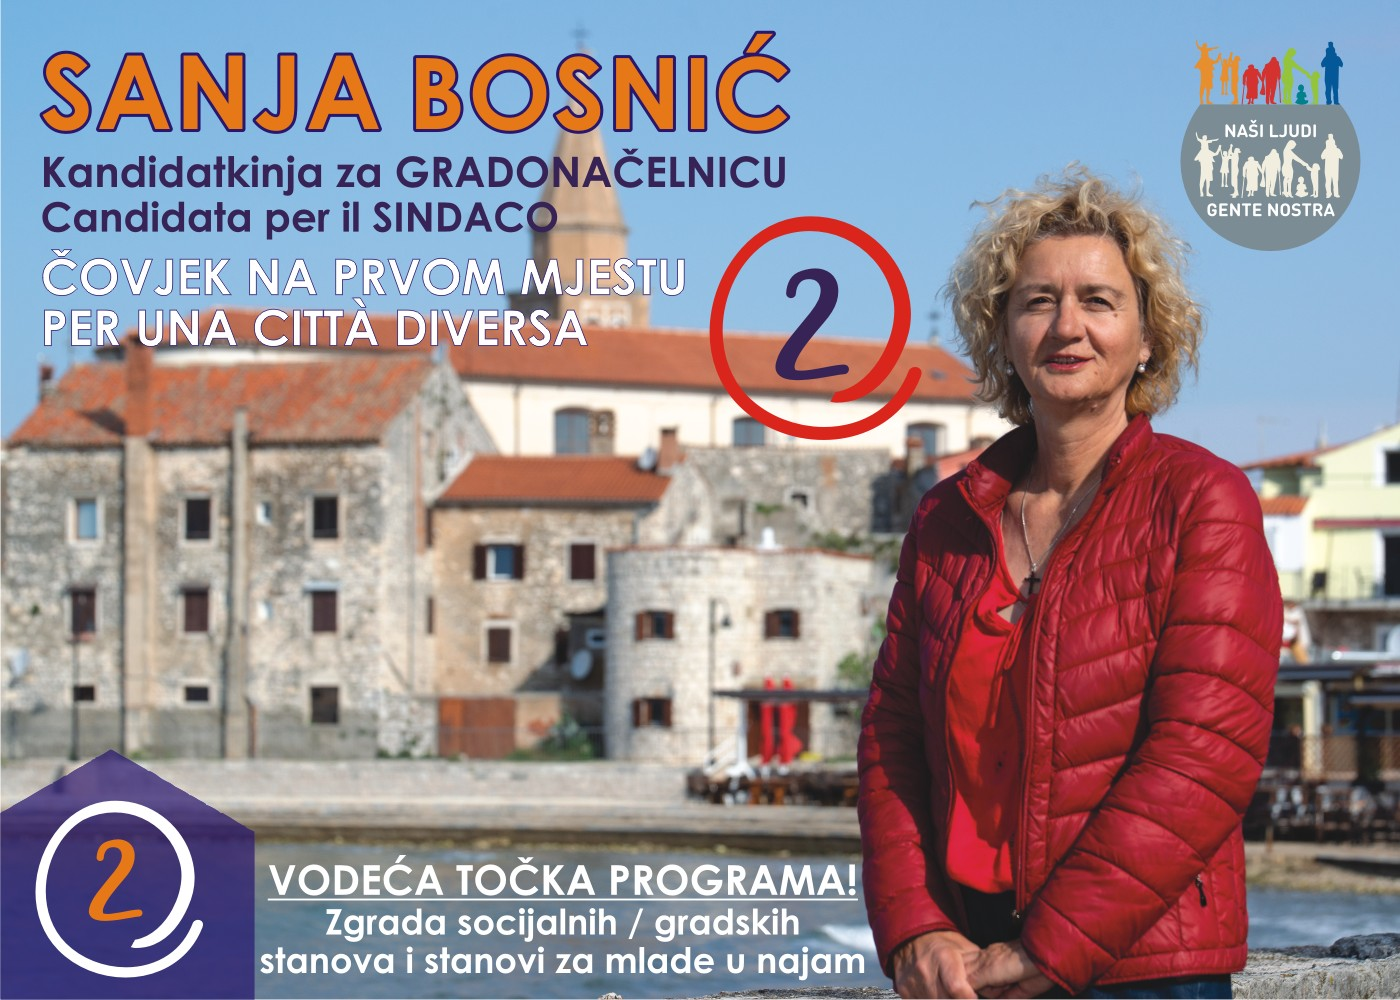 Sanja Bosnic